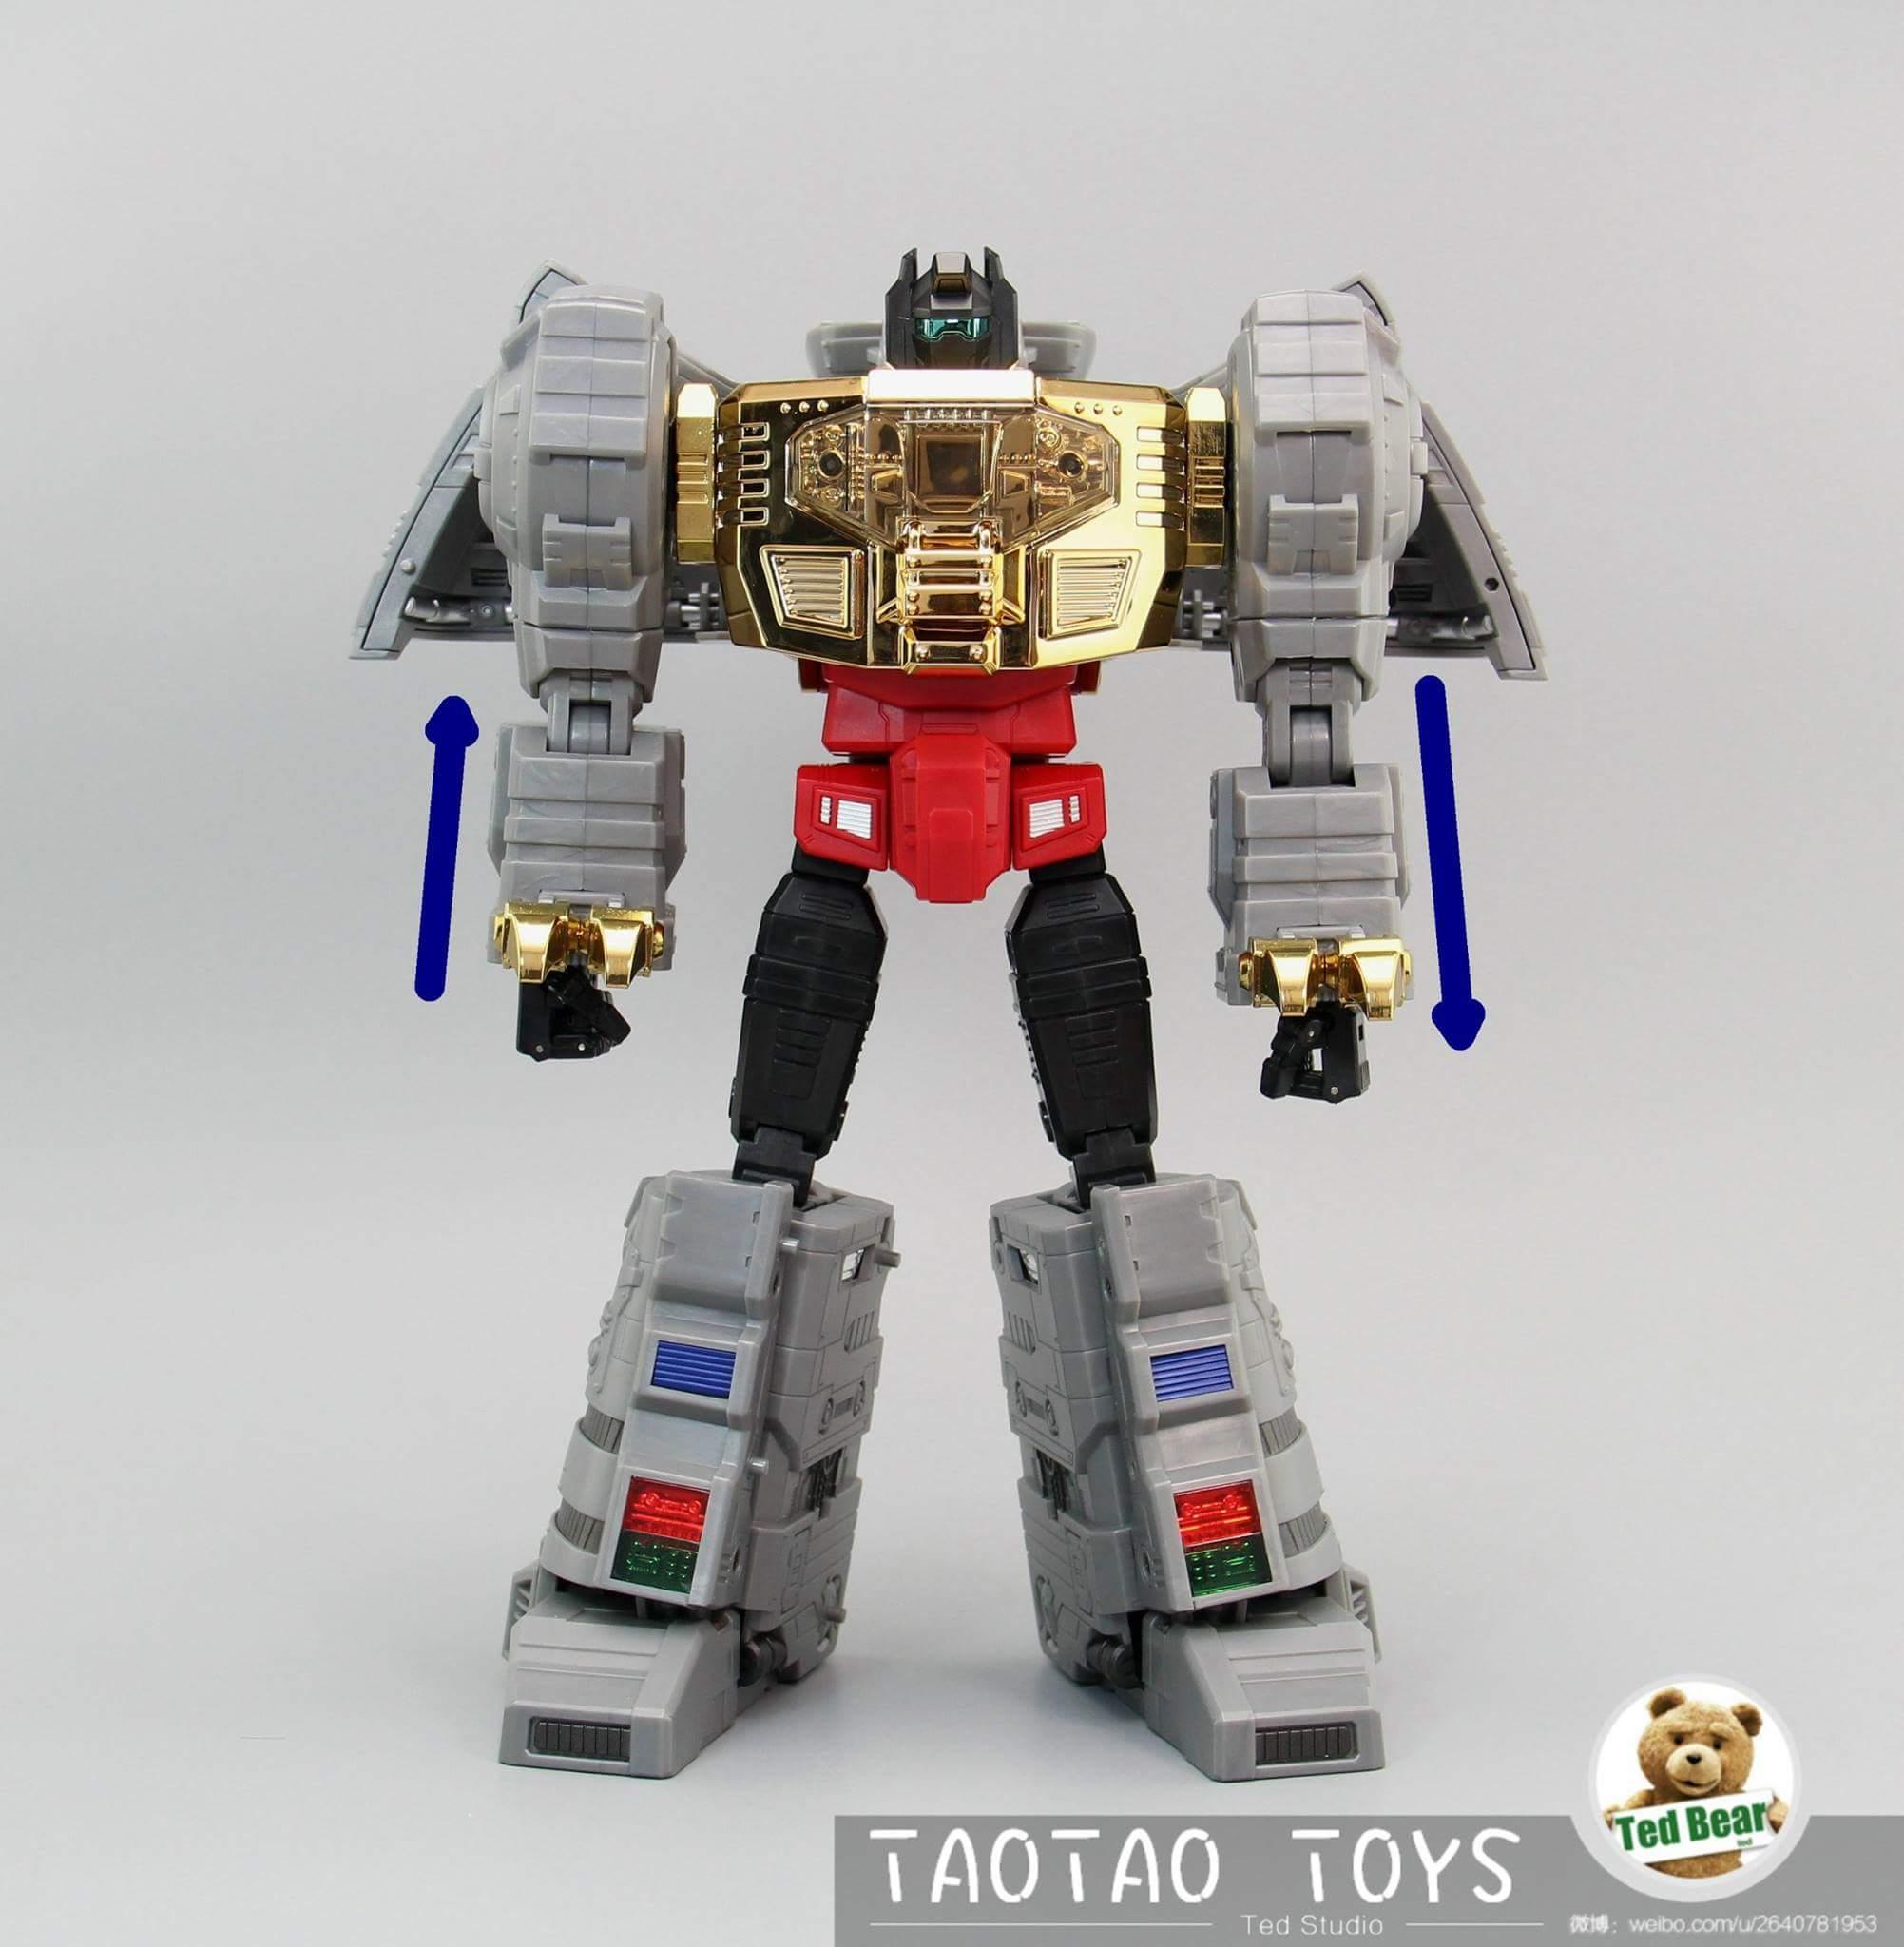 [Fanstoys] Produit Tiers - Dinobots - FT-04 Scoria, FT-05 Soar, FT-06 Sever, FT-07 Stomp, FT-08 Grinder - Page 10 KzJEmocA